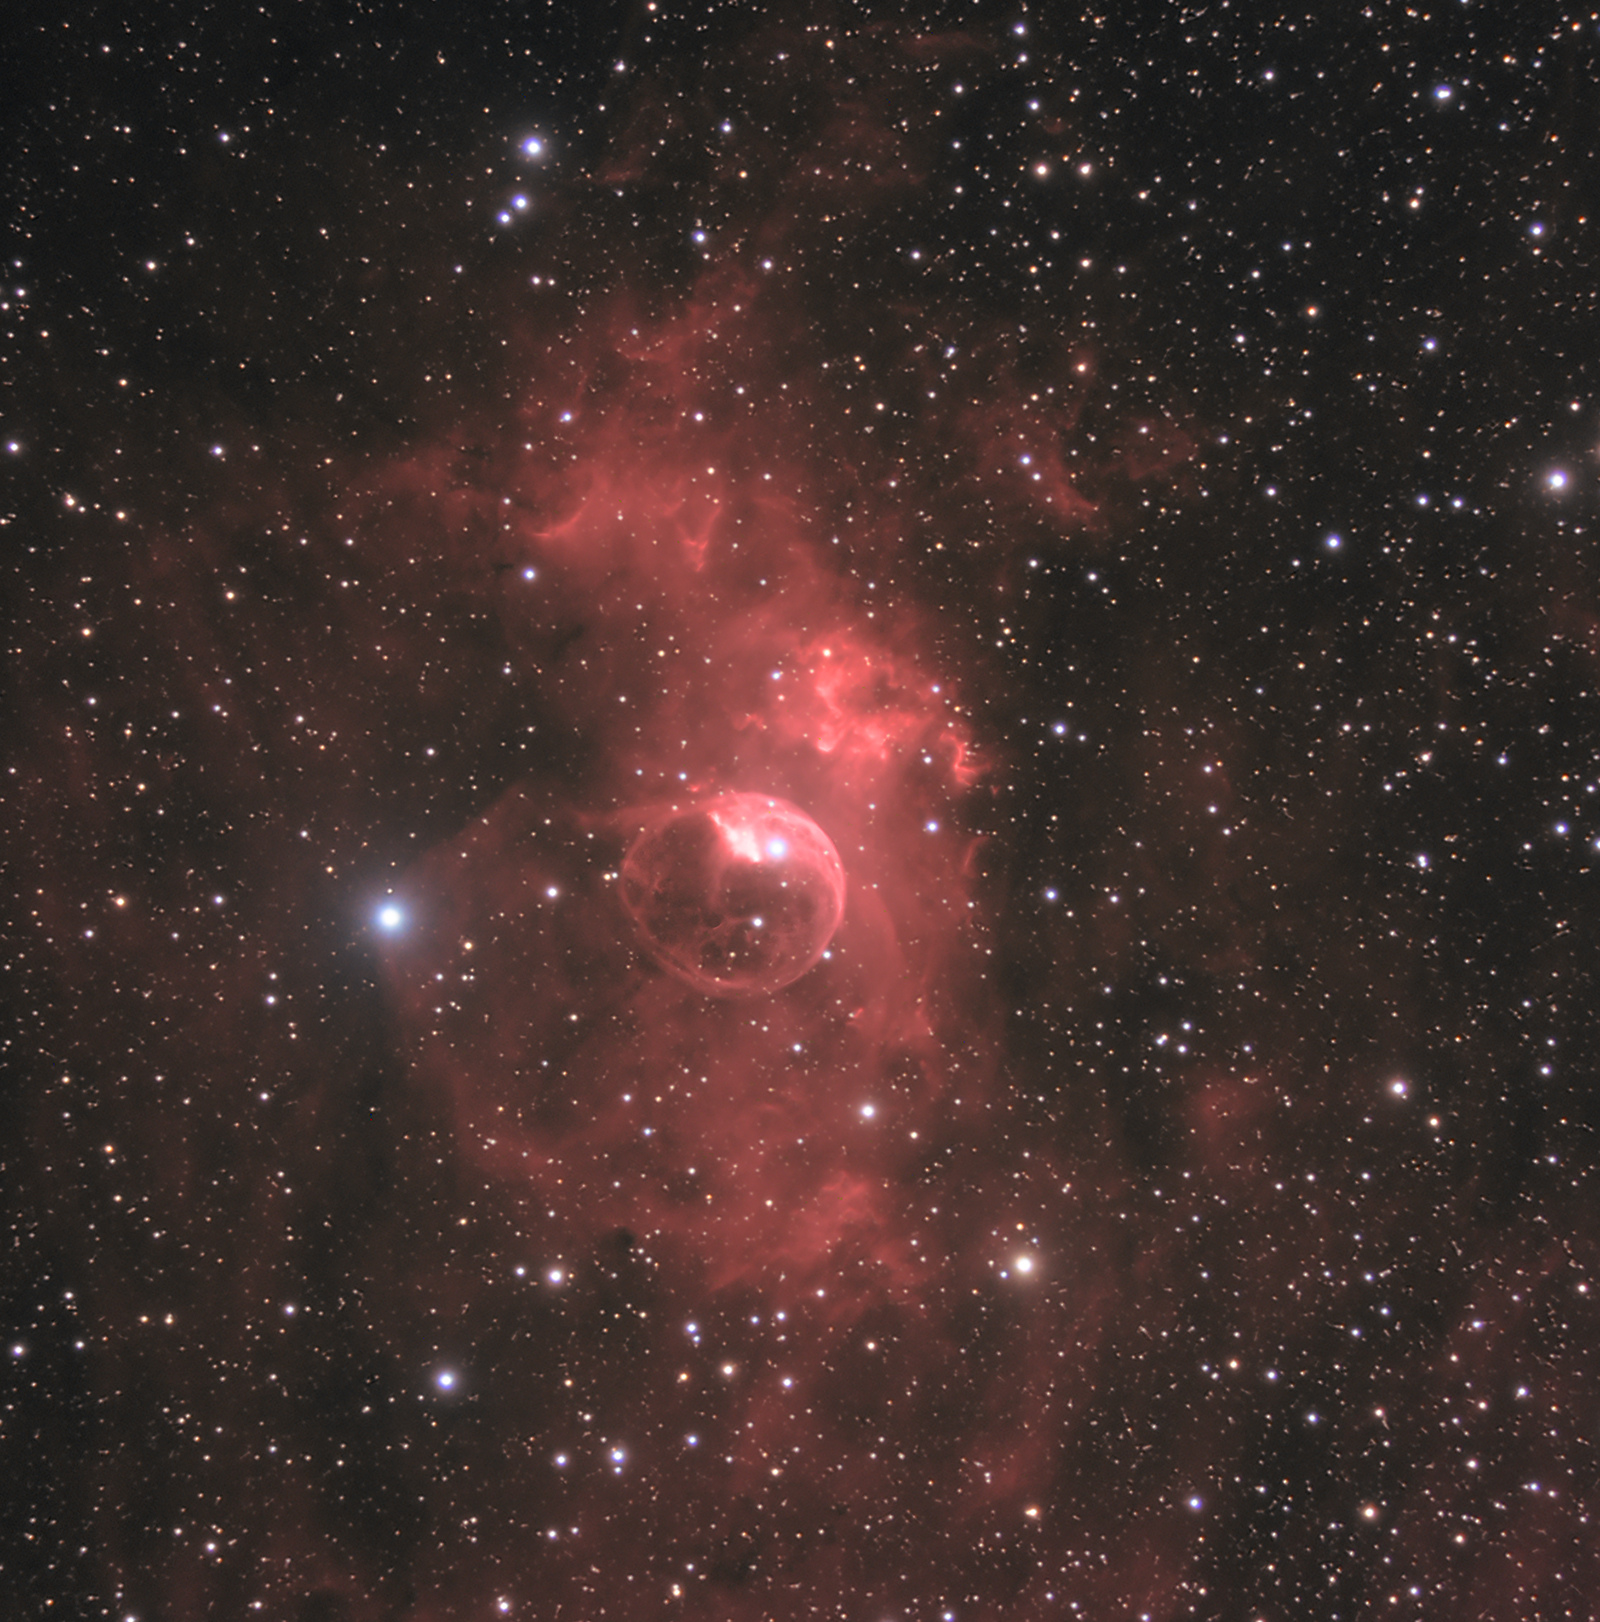 5d4d8c8ca3dfc_NGC7635.jpg.78a5179e6d92d38bbd1f890707566d8f.jpg